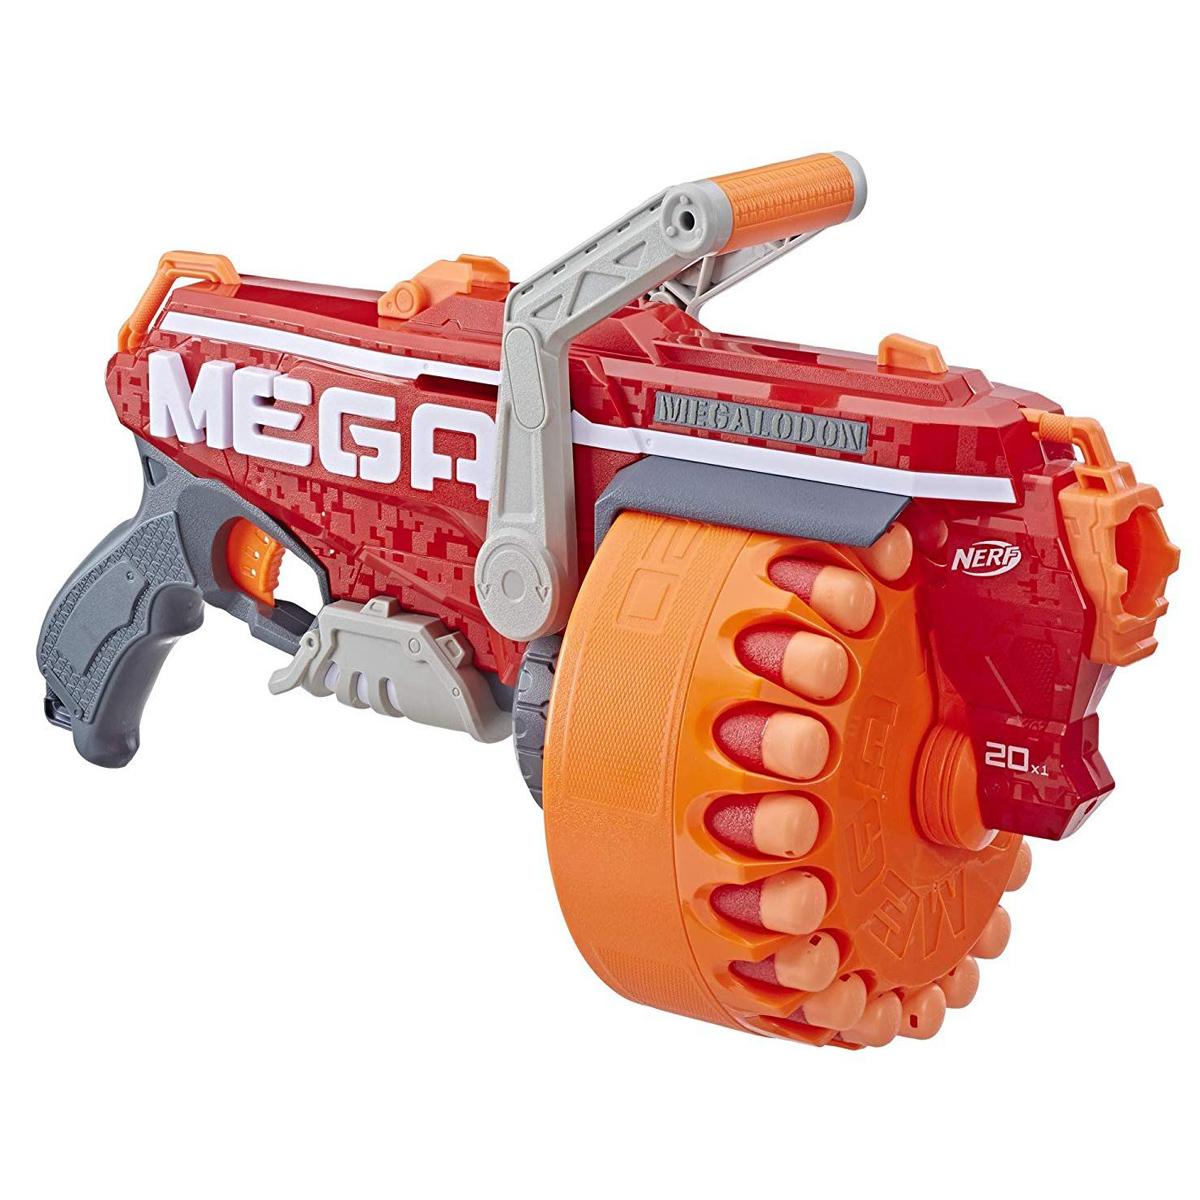 تفنگ بازی نرف مدل Nerf Mega Megalodon